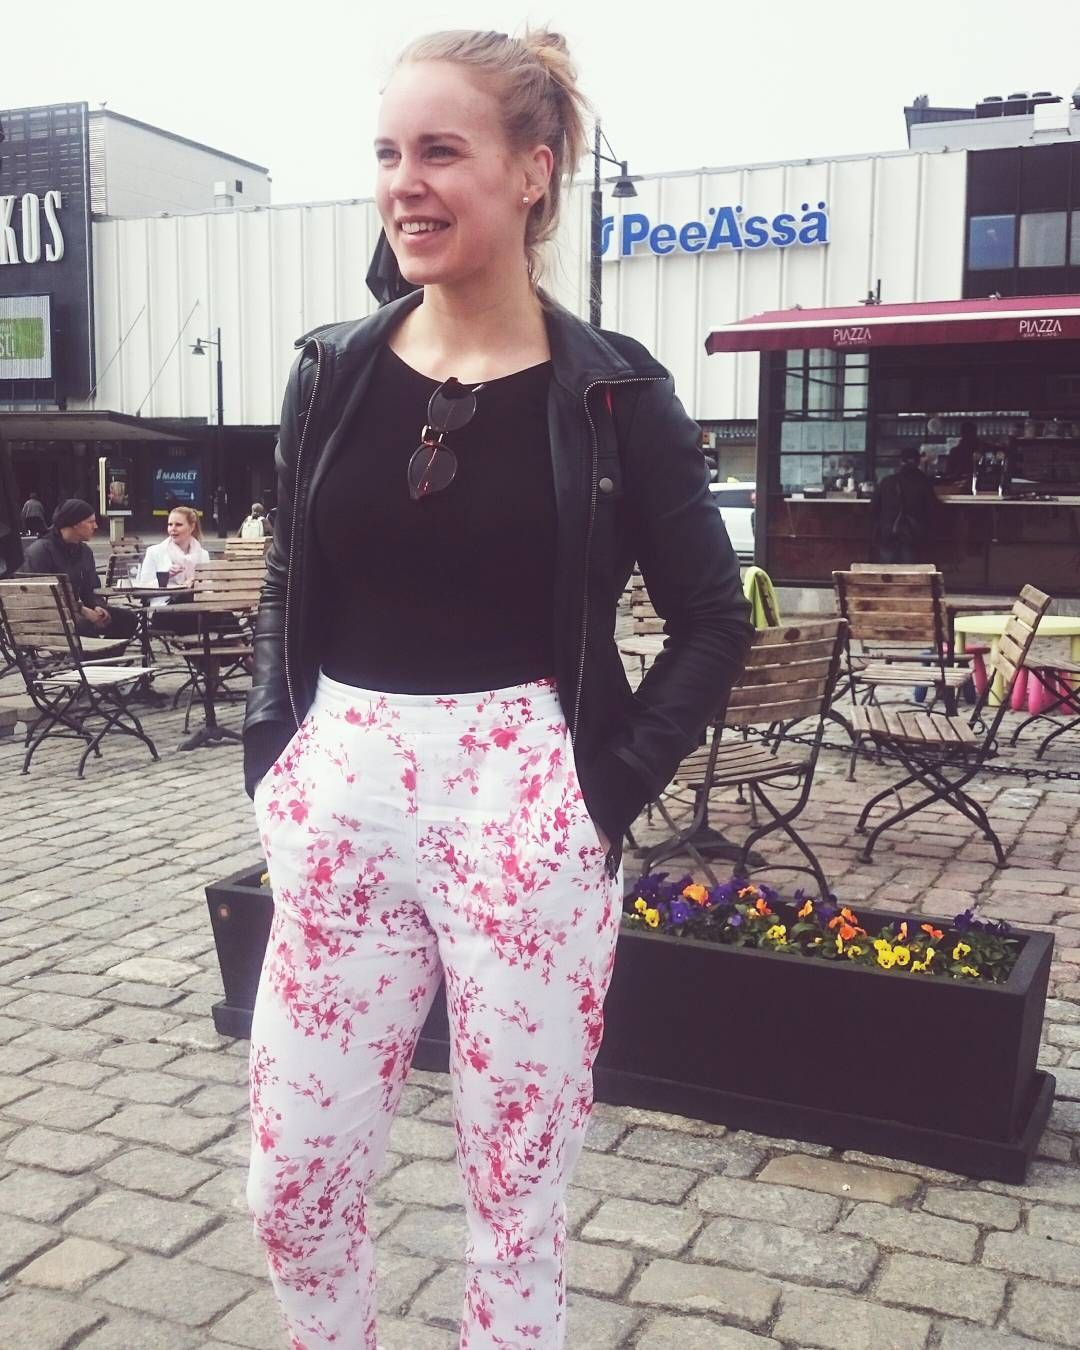 Lomalaisen on helppo hymyill�#photography #photo #kuopio #fun #fashion #outfit #happy #smile http://tipsrazzi.com/ipost/1523910712702762109/?code=BUmBLgcD3x9